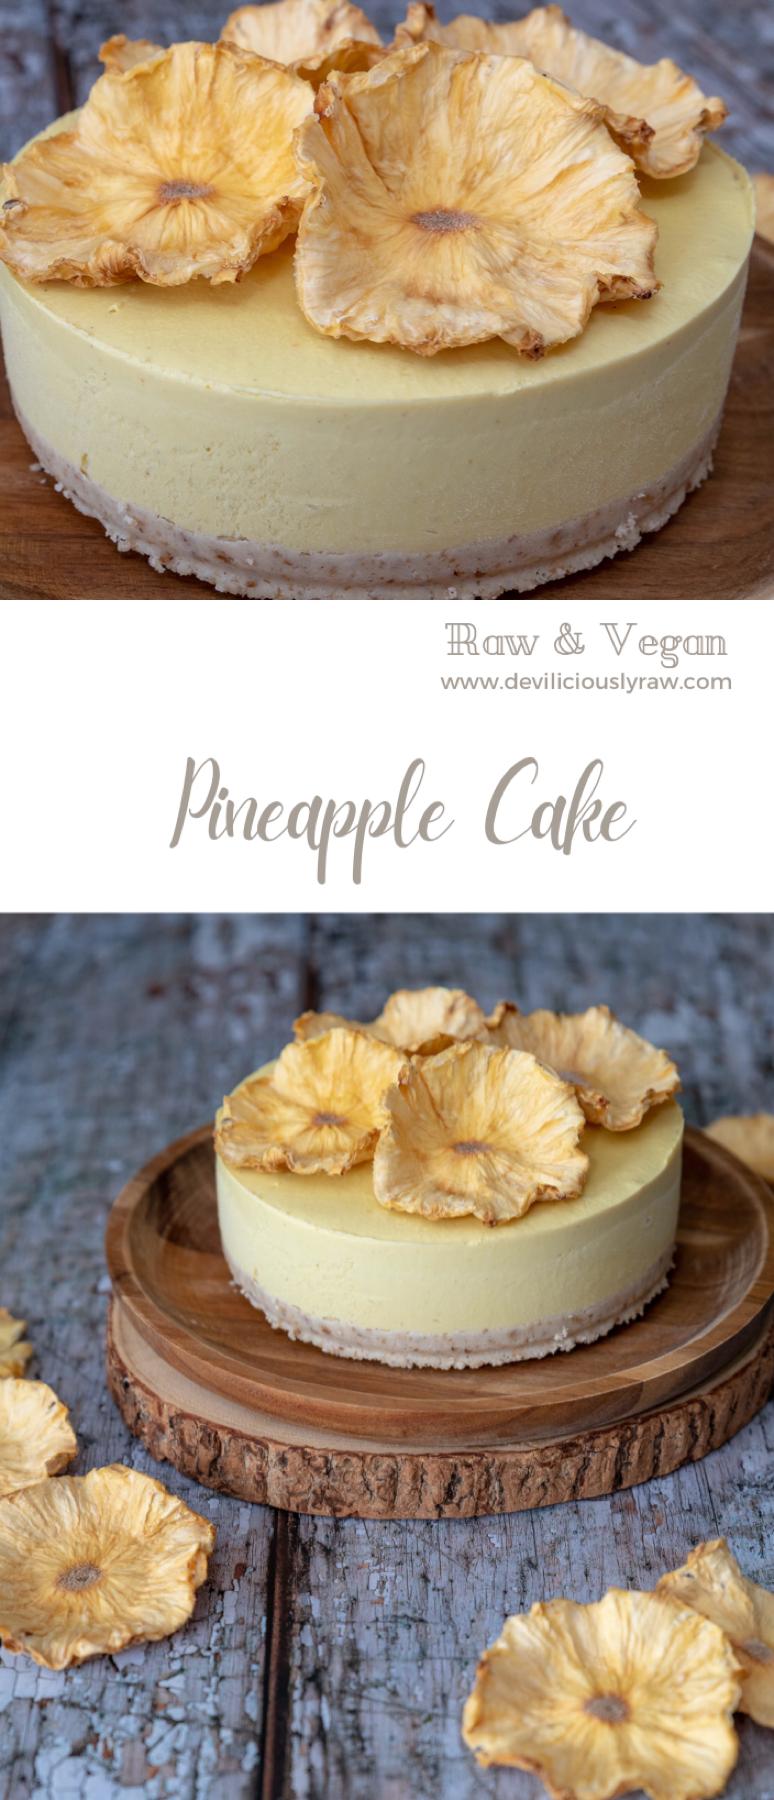 Tropical Pineapple Cake